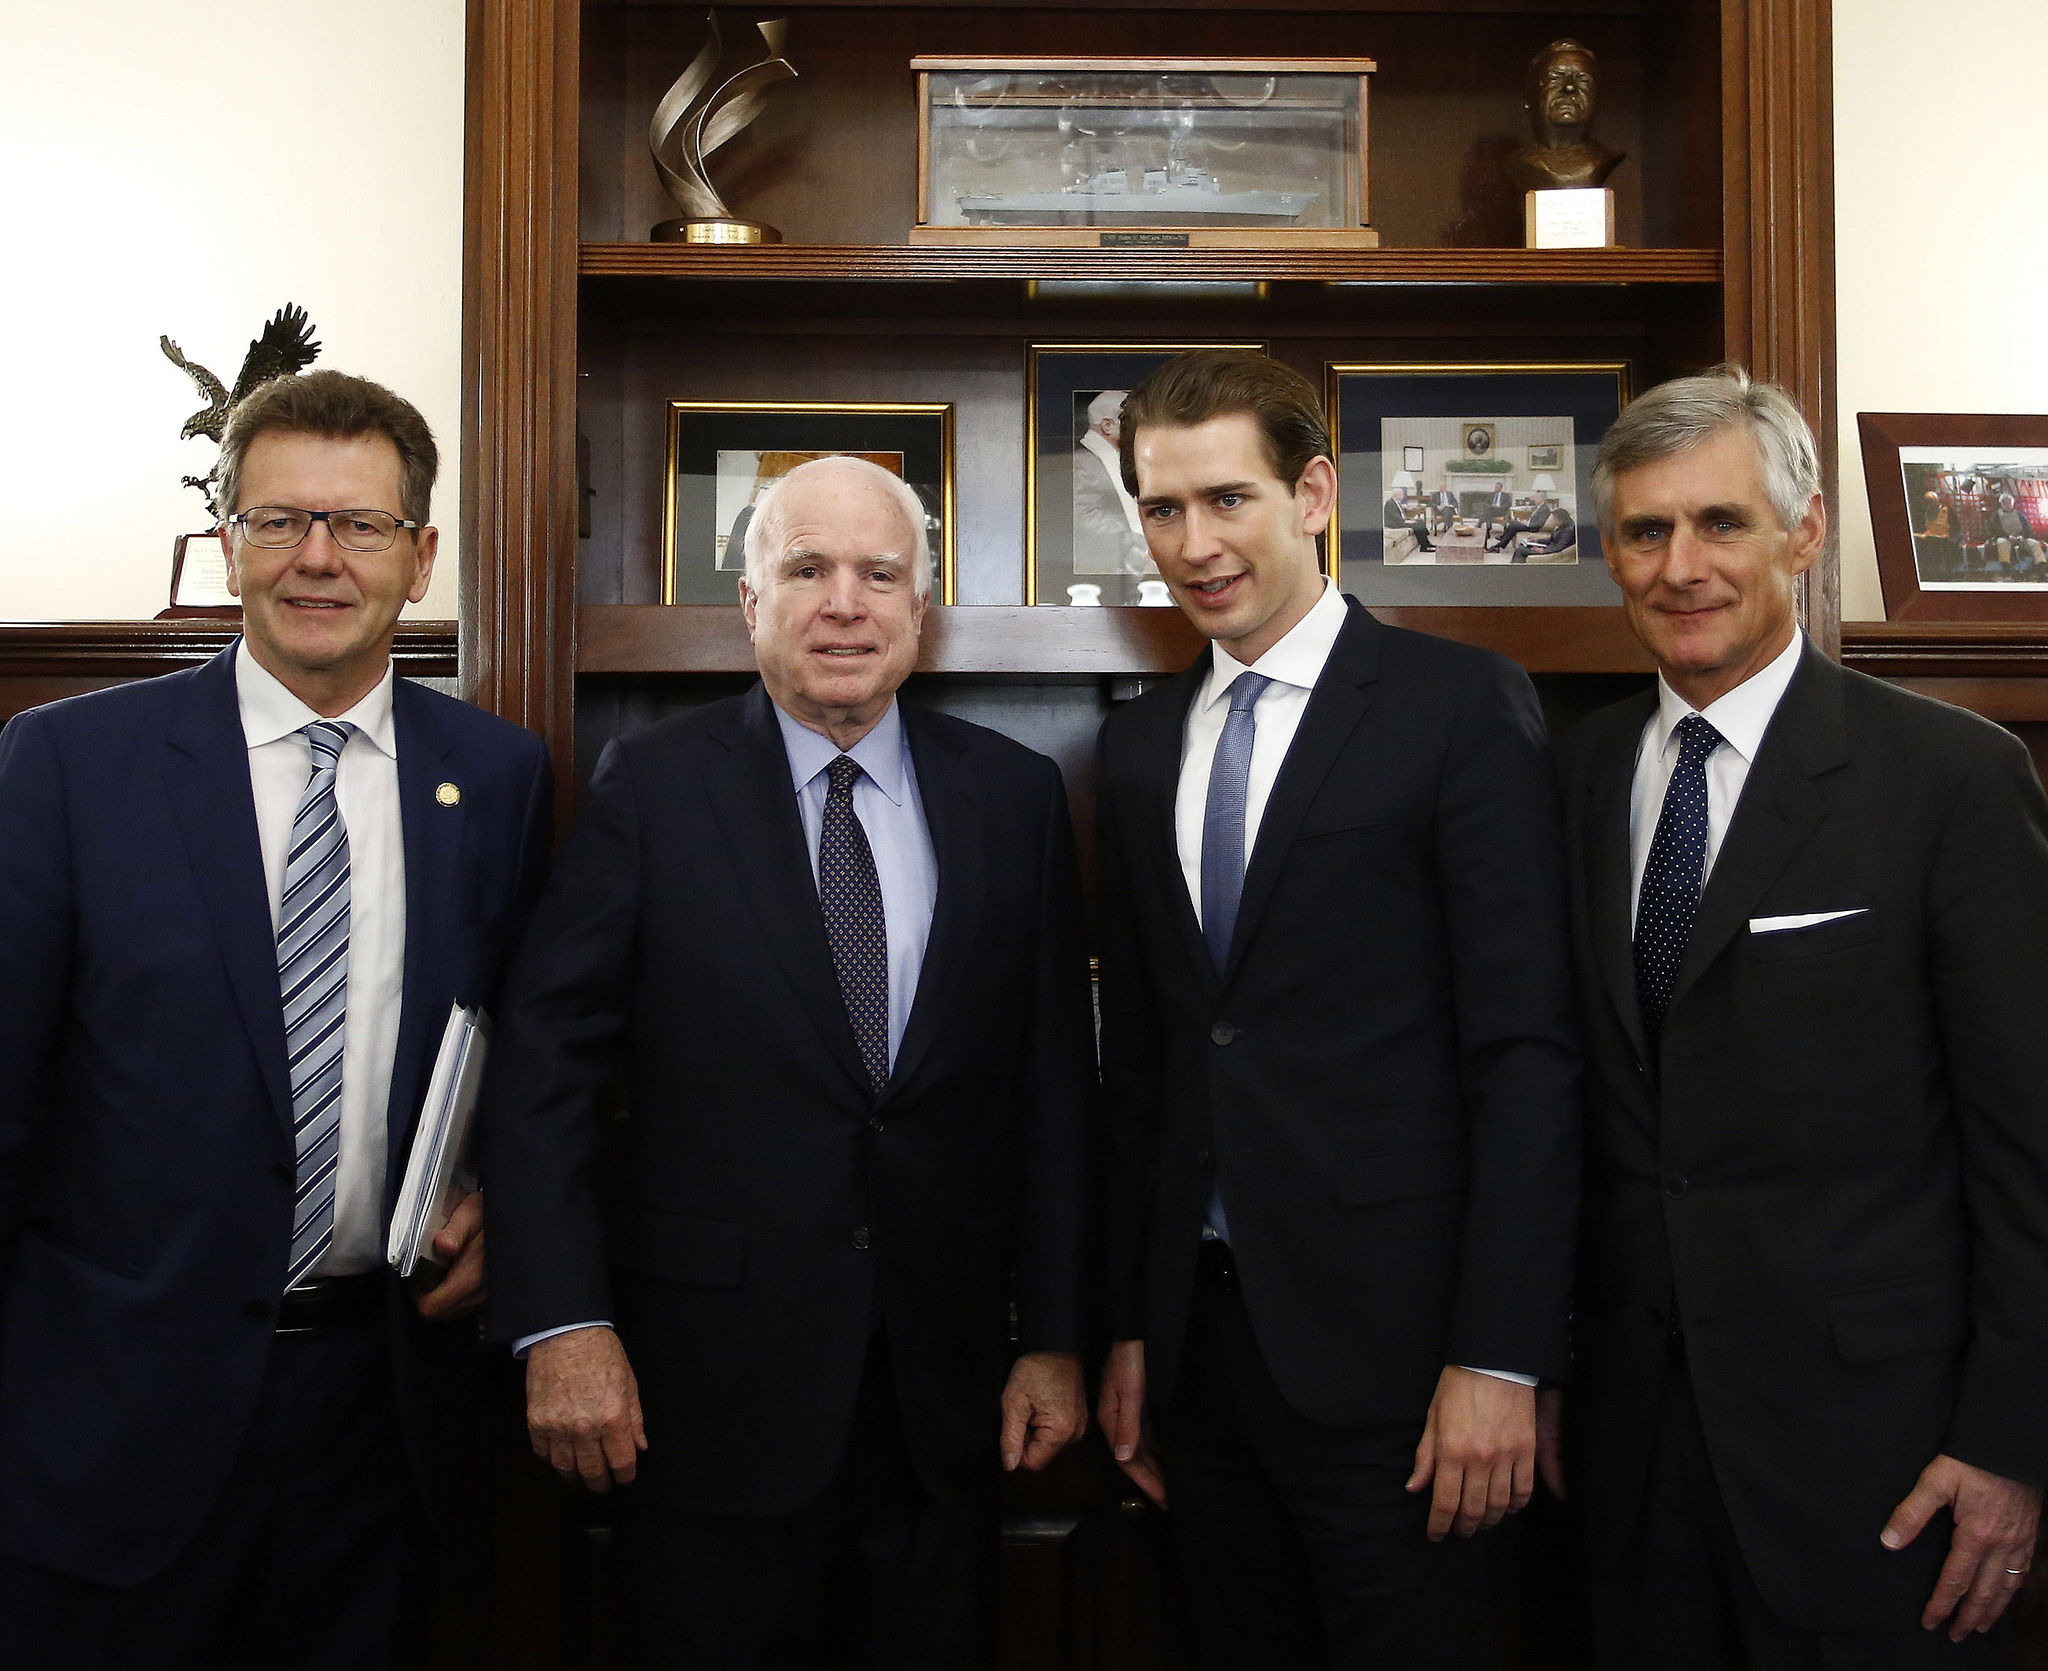 Senator Mc Cain with FM Kurz, SG Linhart & Amb. Waldner. Photo: Dragan Tatic